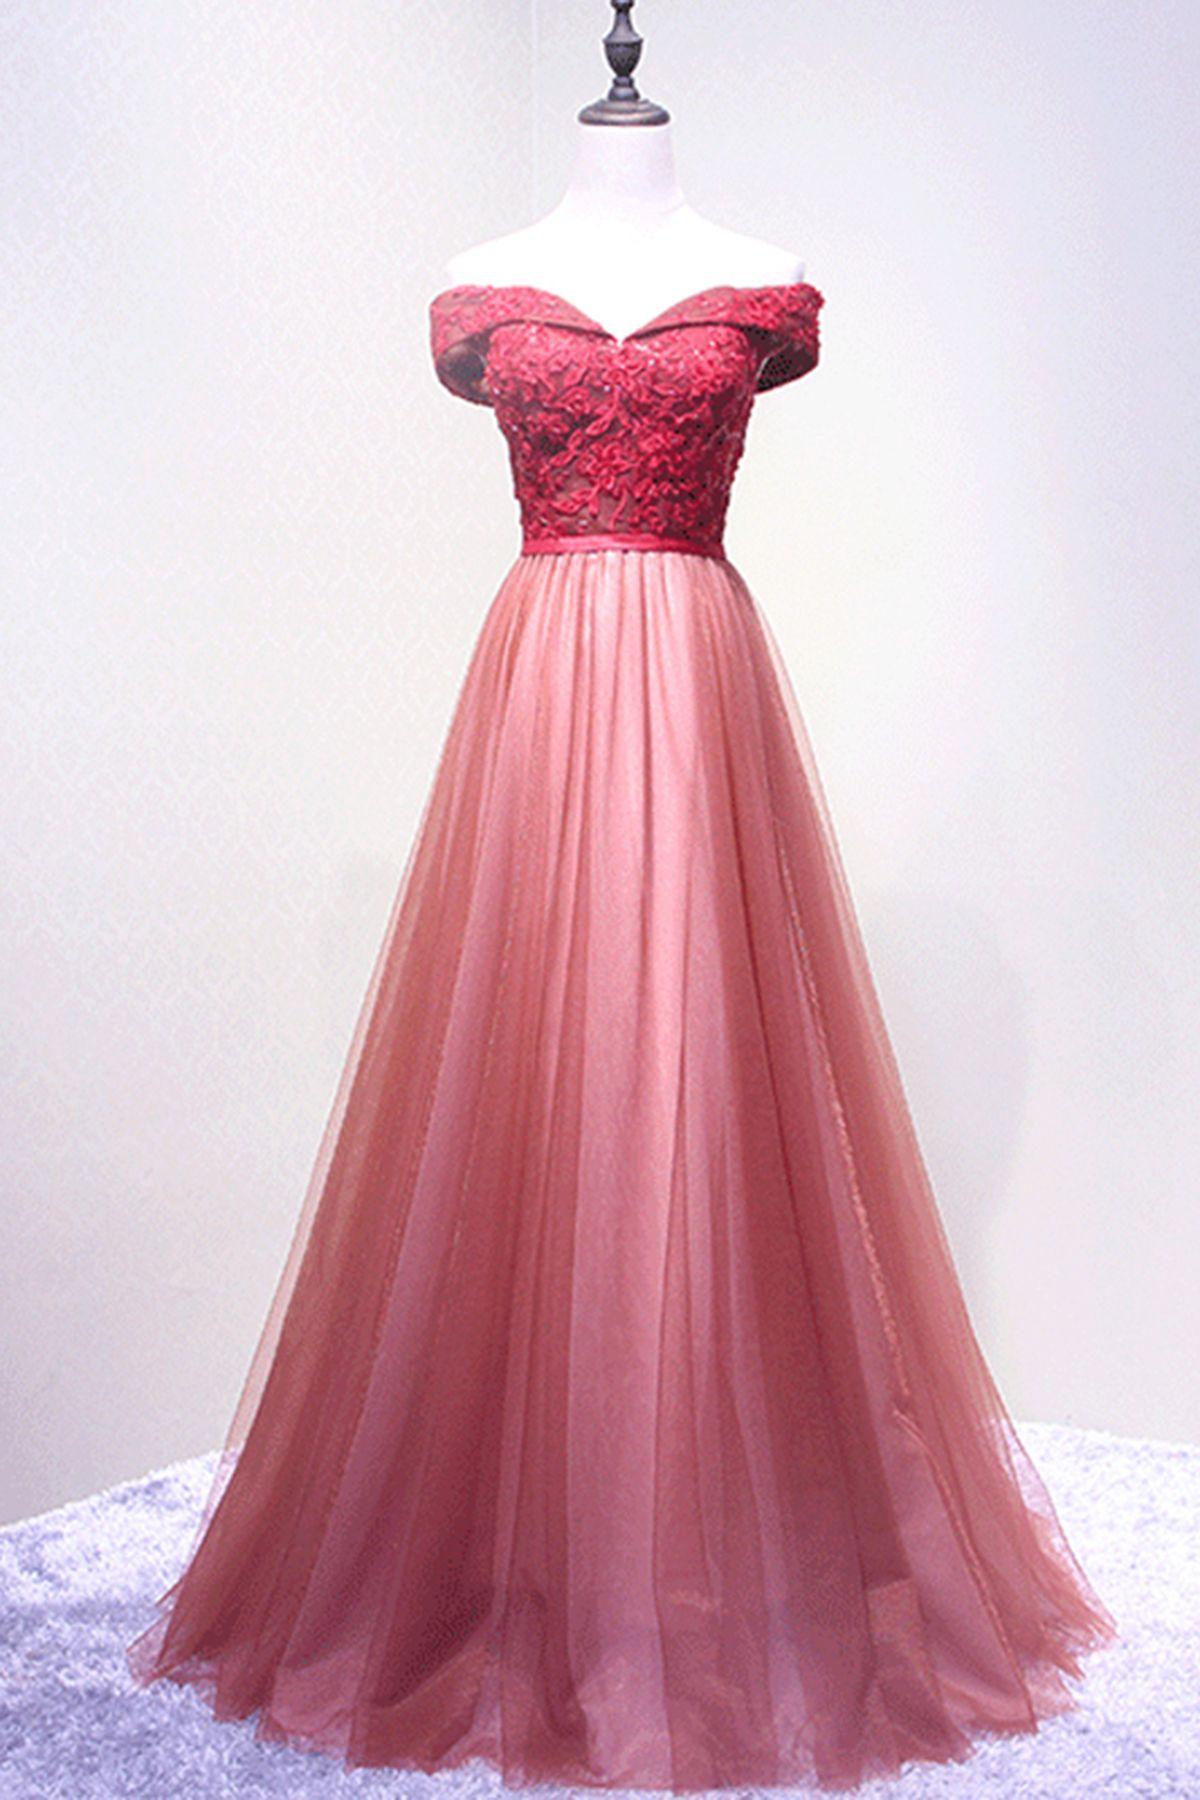 Abend Fantastisch Abendkleid Carmen Ausschnitt Lang Stylish10 Einfach Abendkleid Carmen Ausschnitt Lang Vertrieb